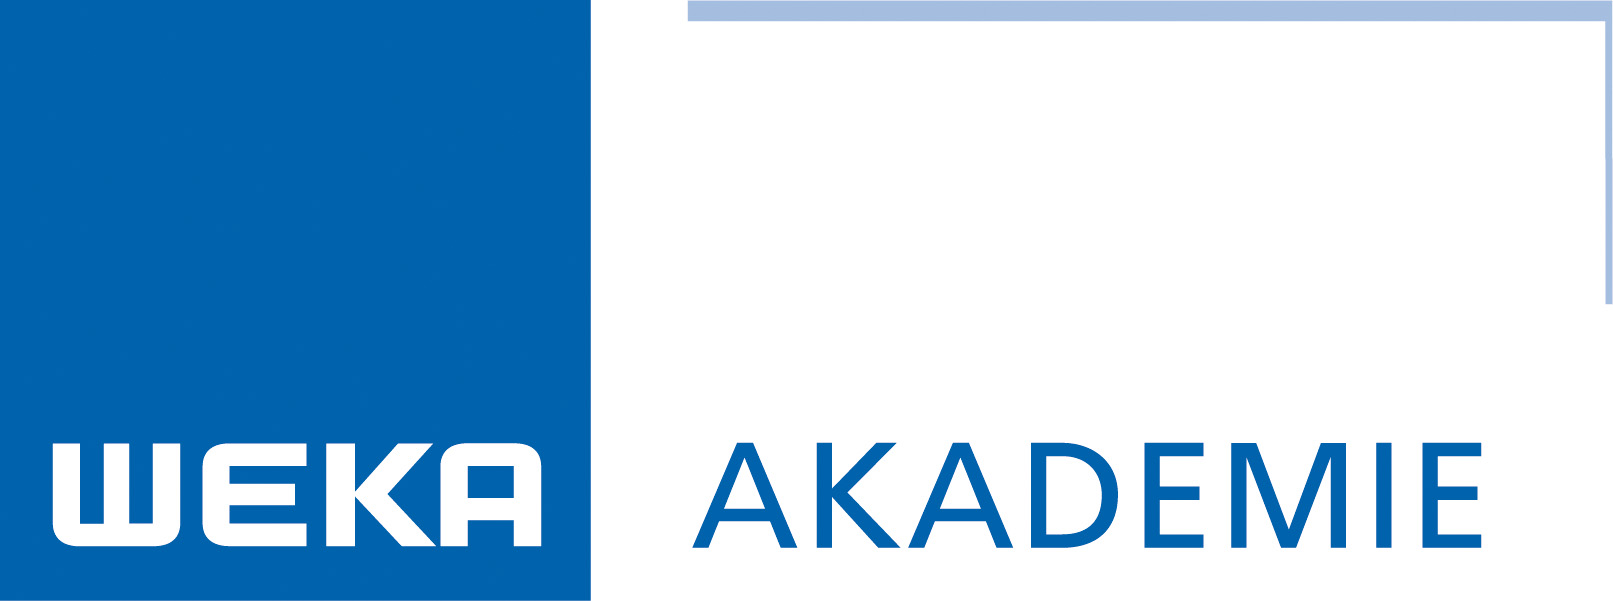 https://www.weka-akademie.de/